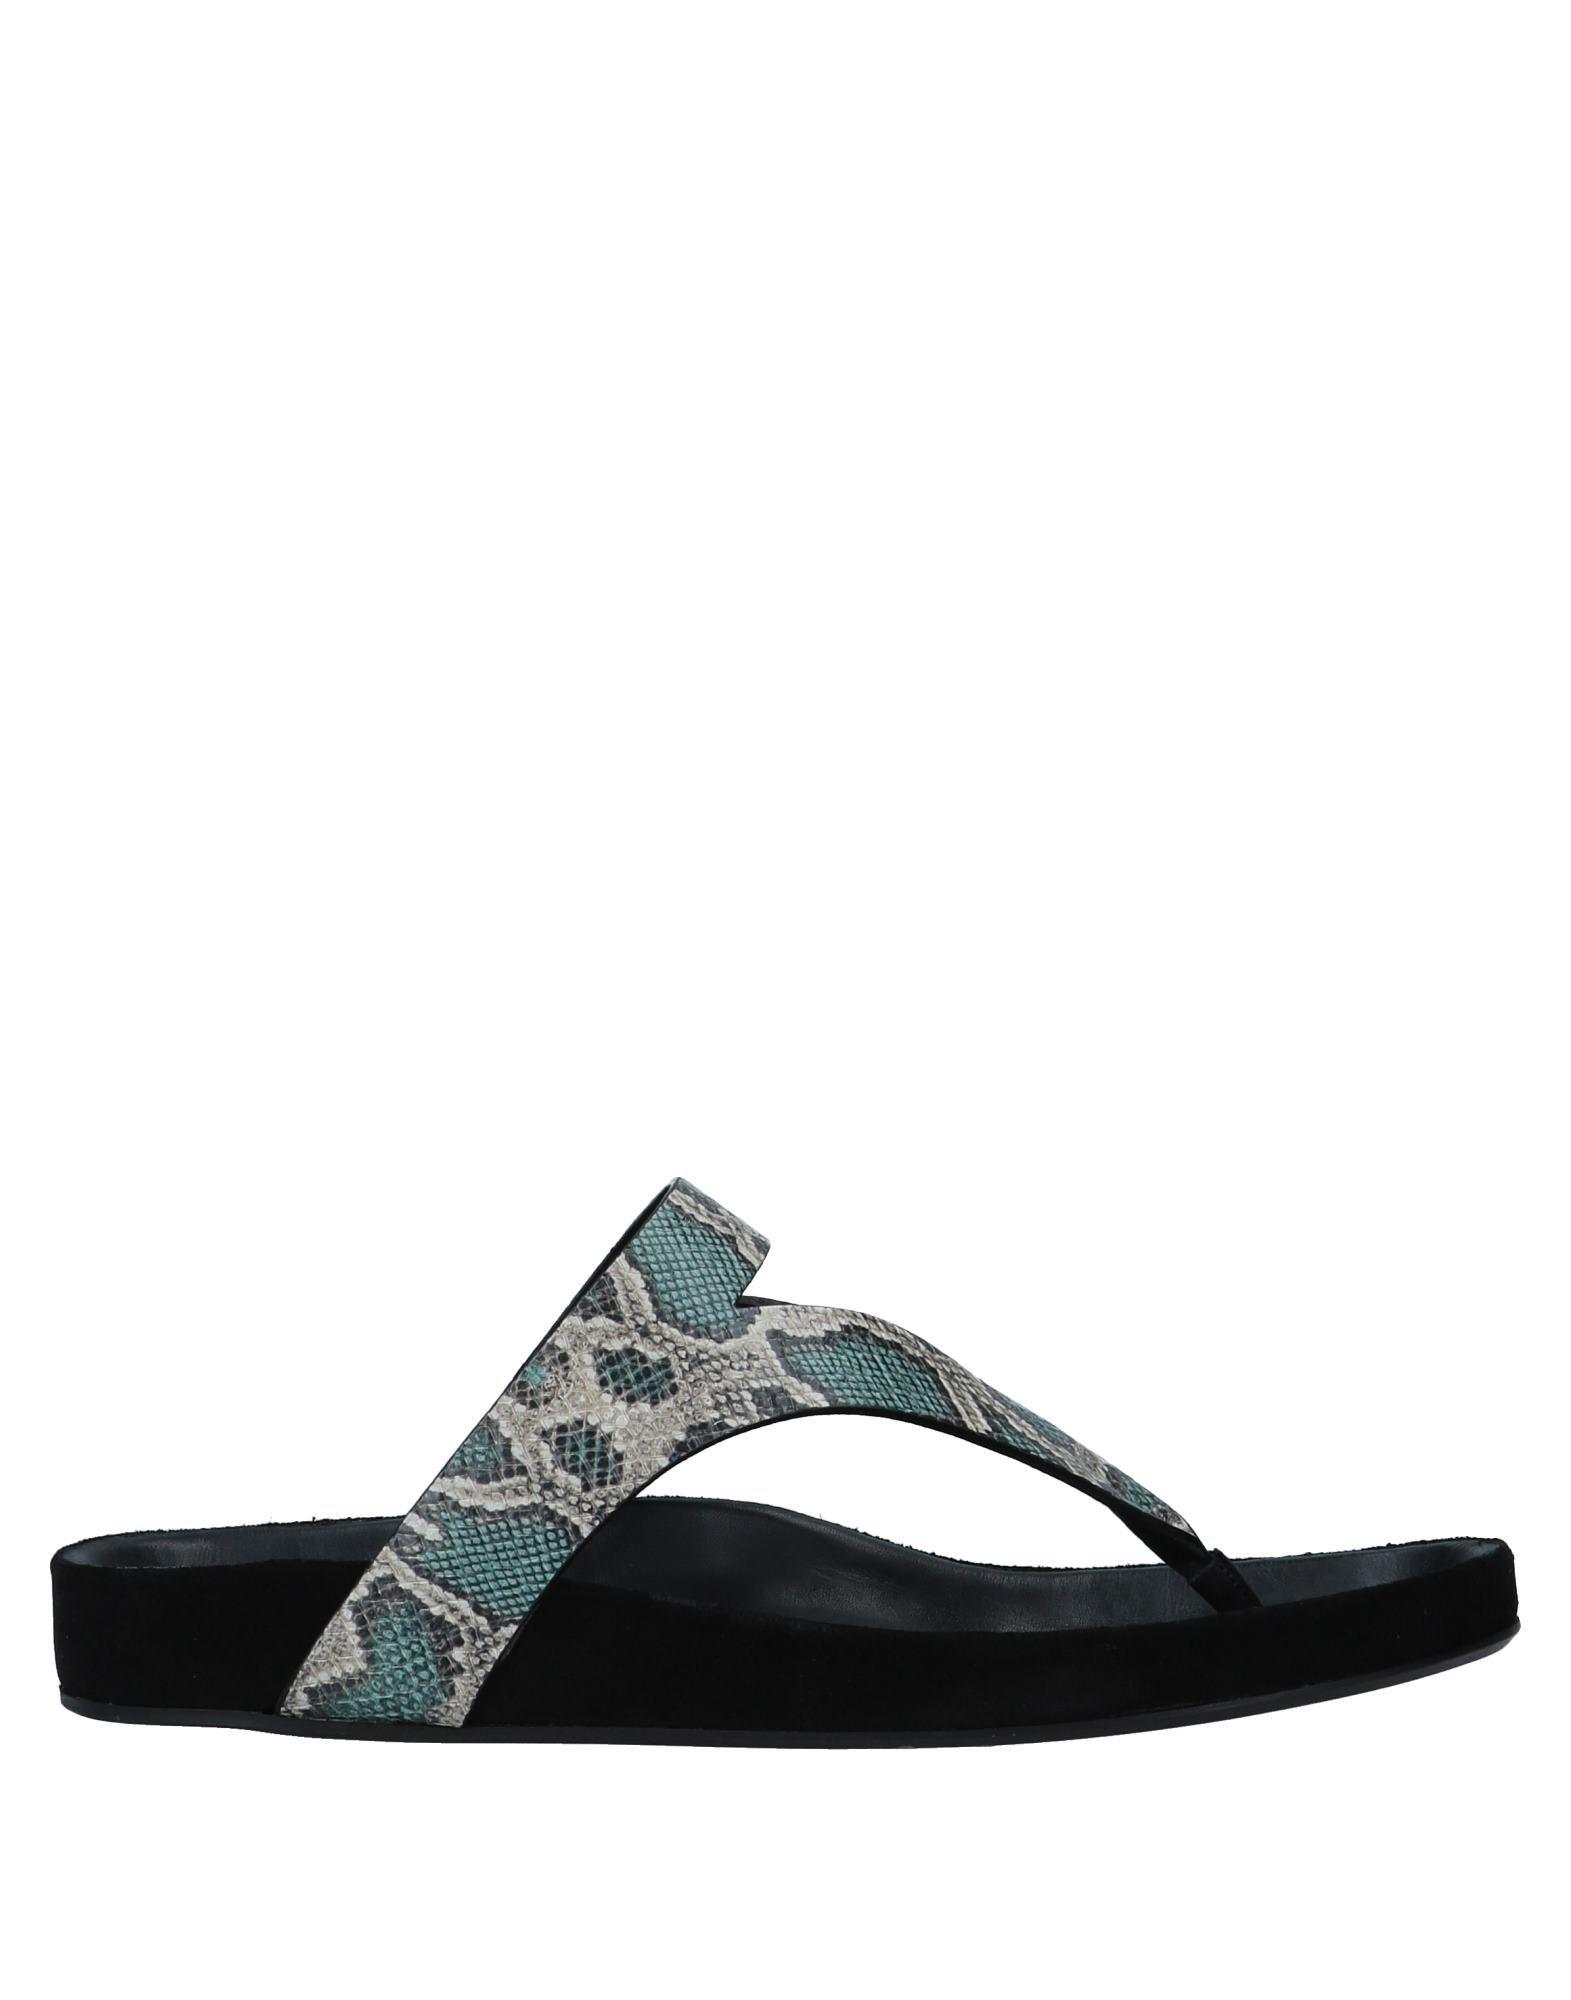 2eda23e4d9 Isabel Marant Flip Flops - Women Isabel Marant Flip Flops online on ...